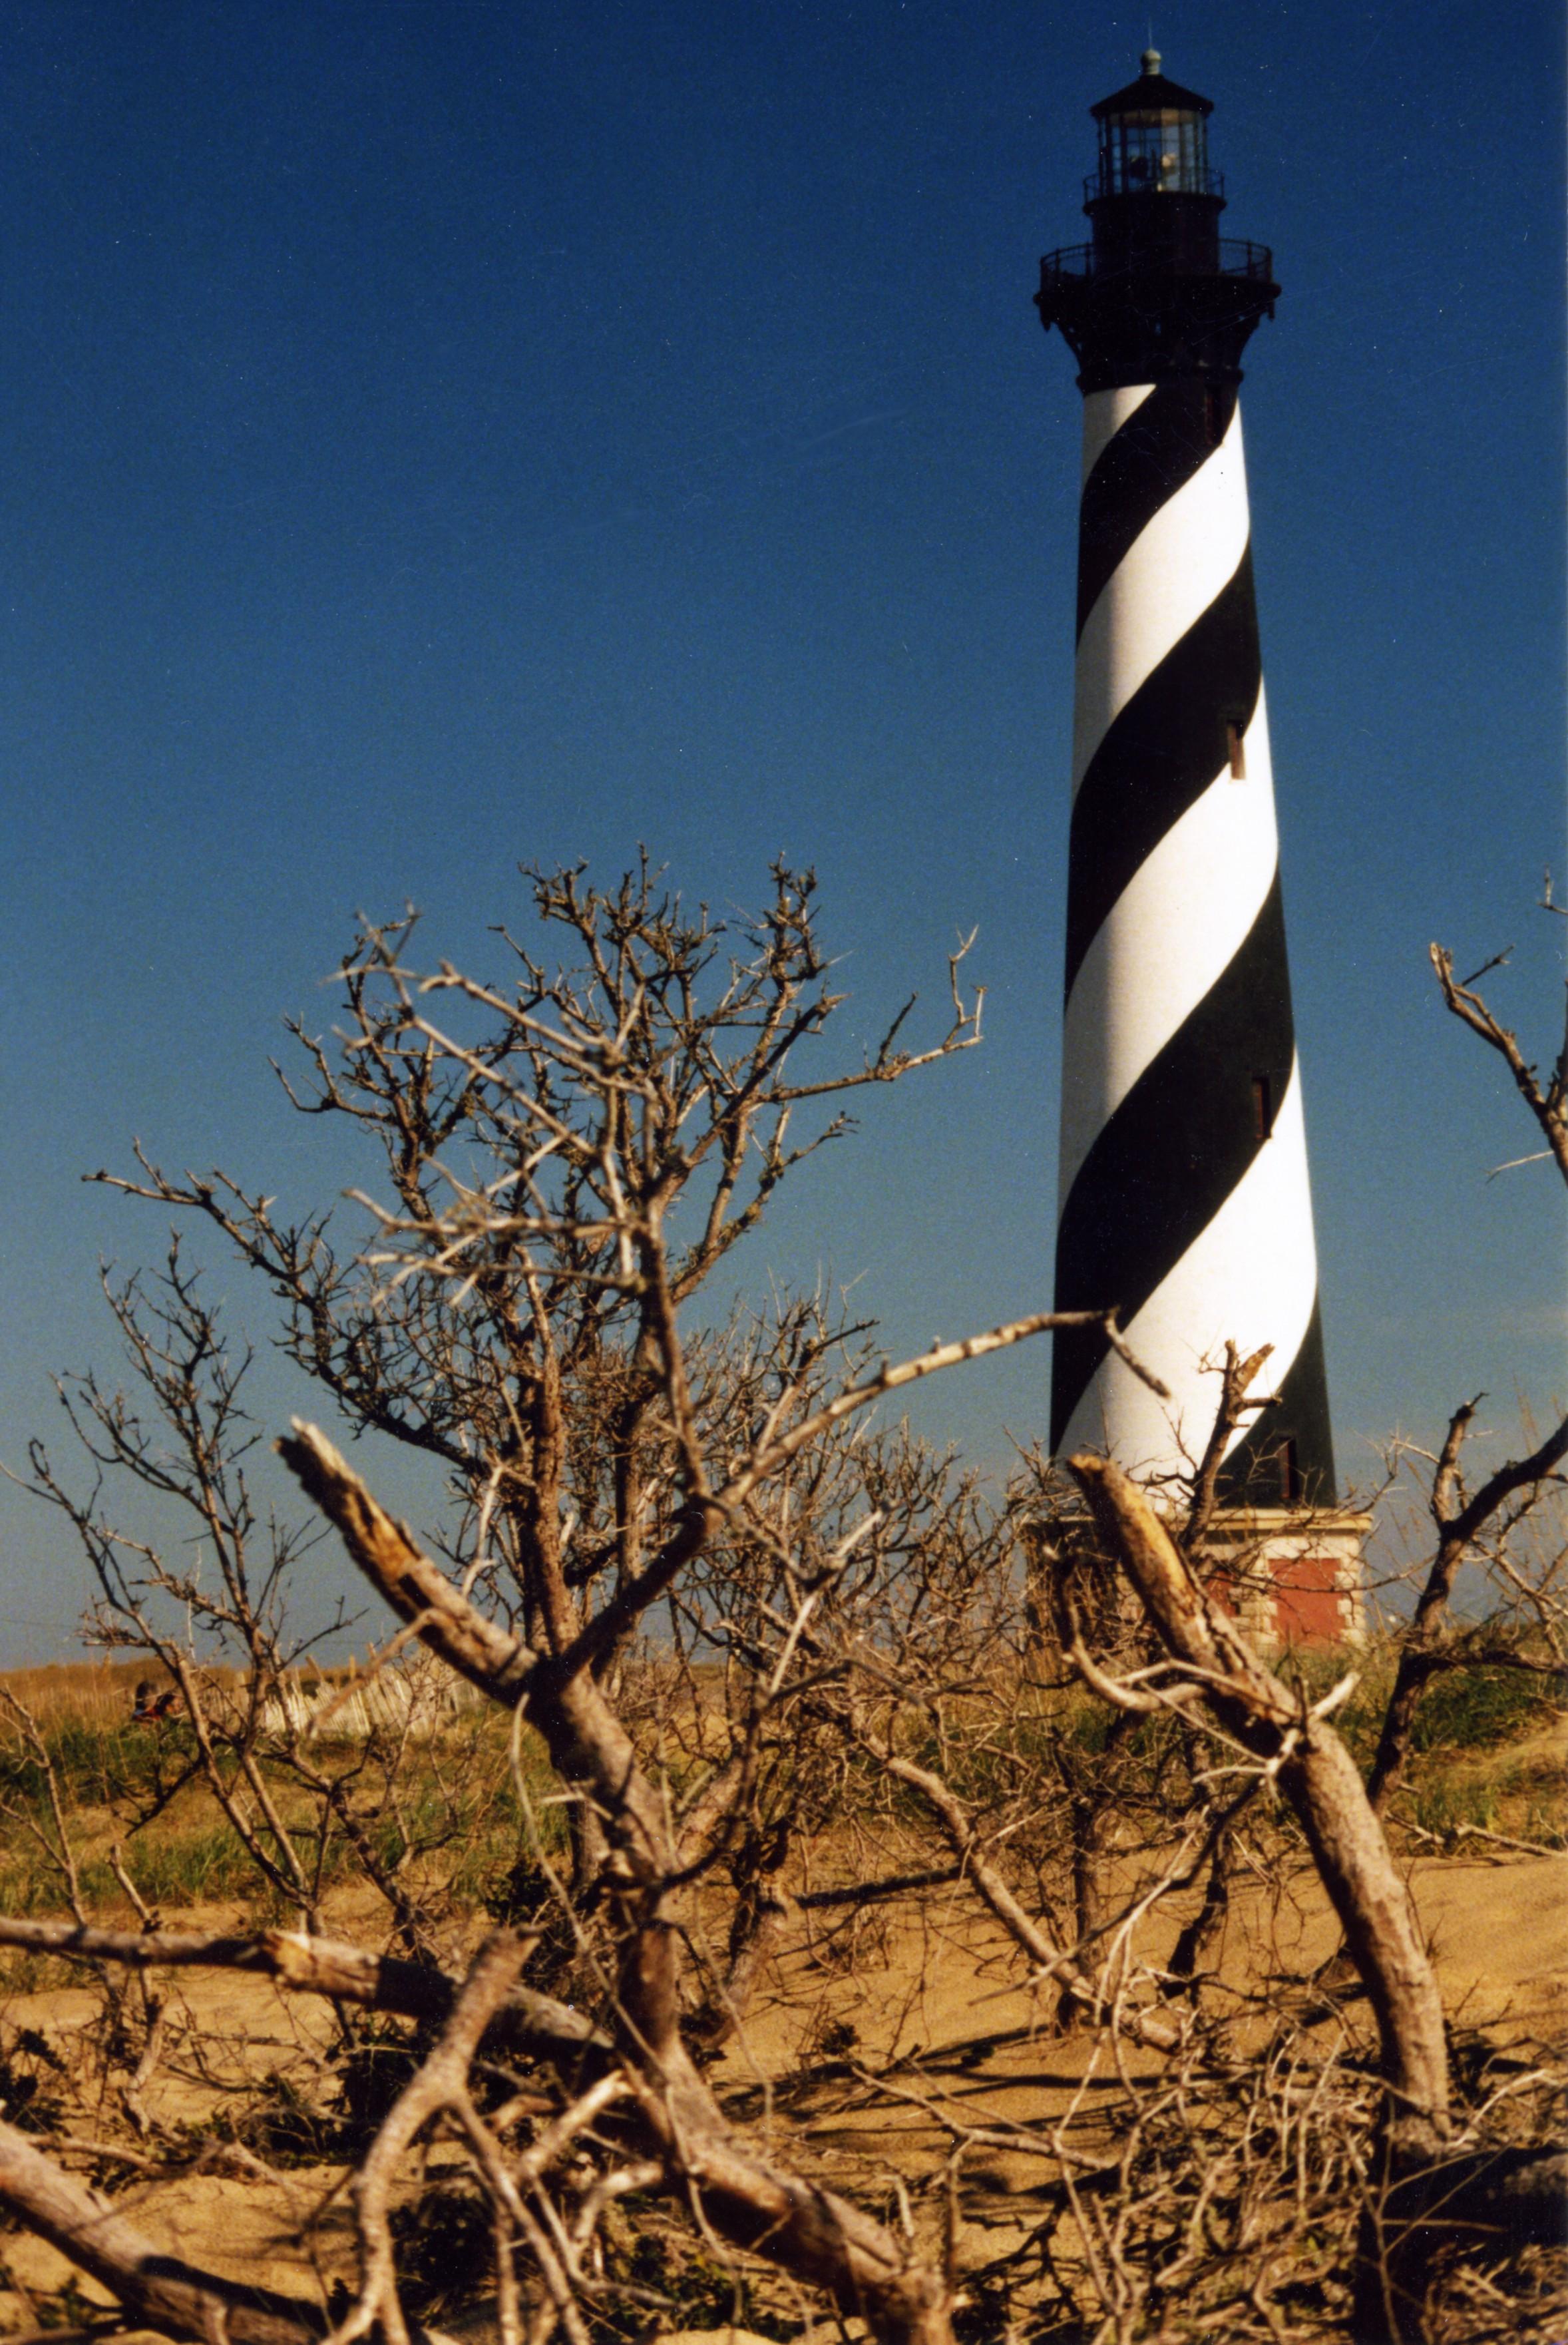 Cape Hatteras, Black, Bspo06, Dry, House, HQ Photo